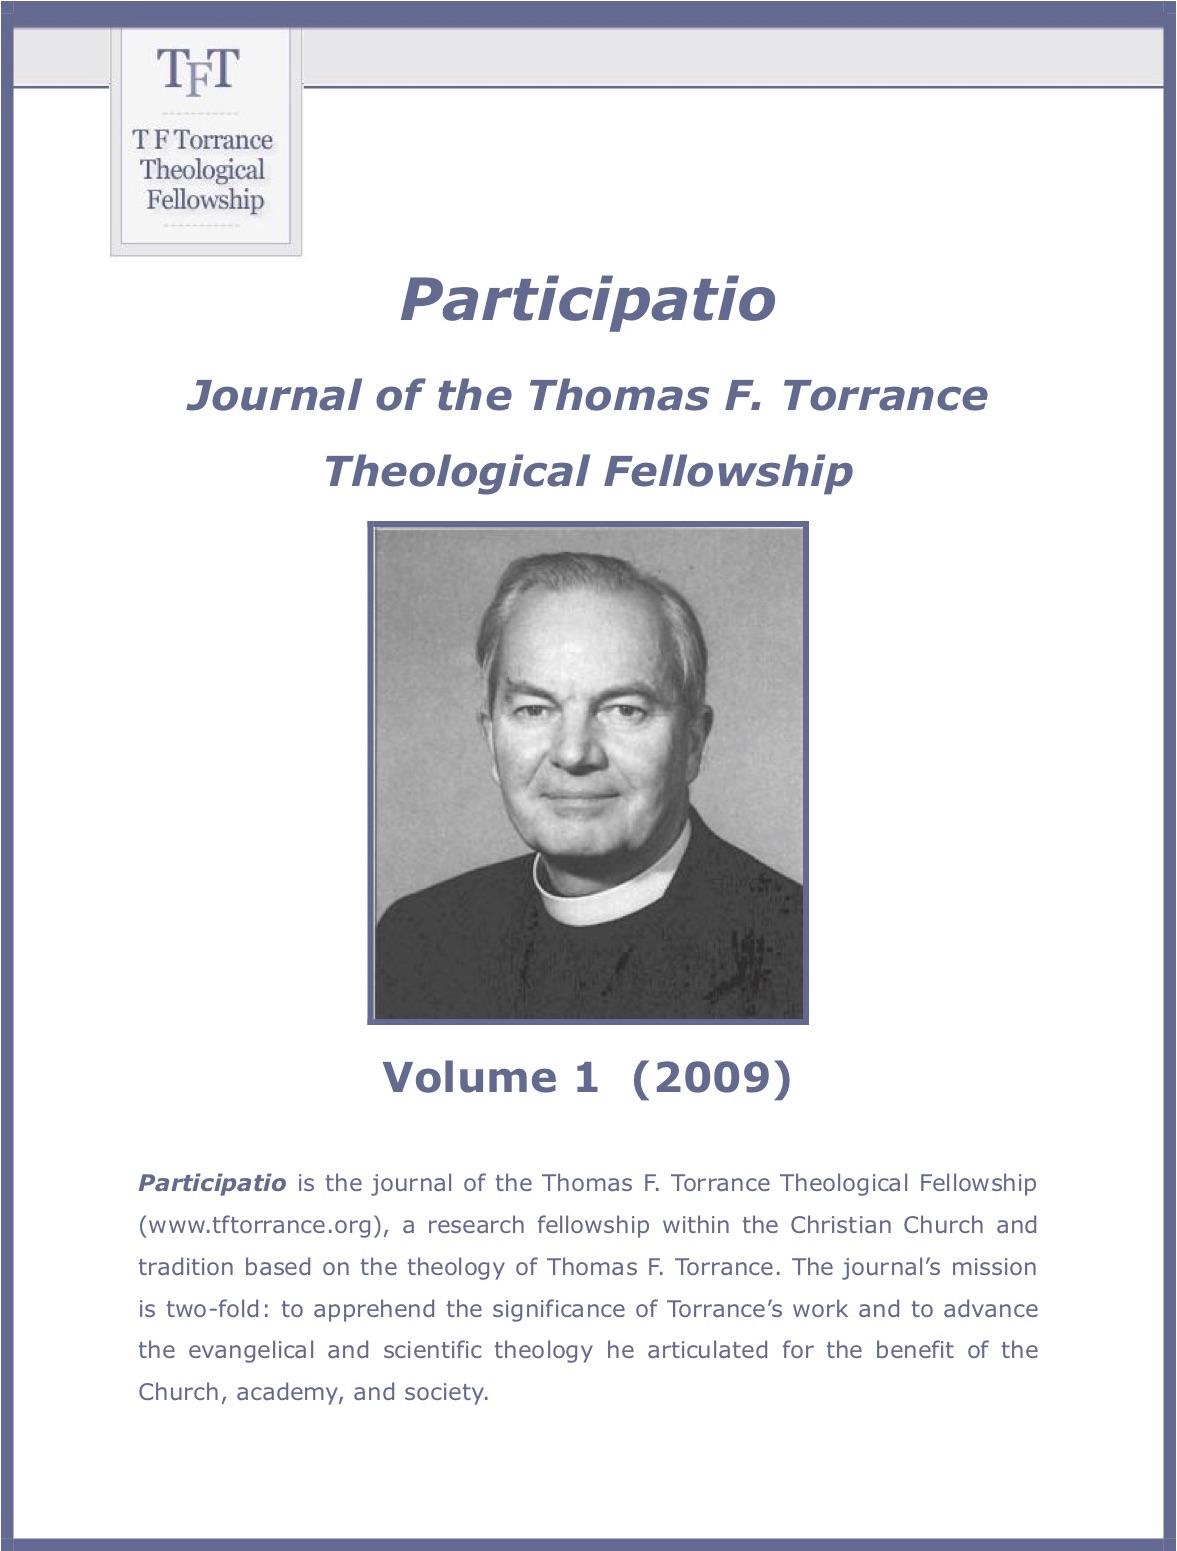 Participatio cover page